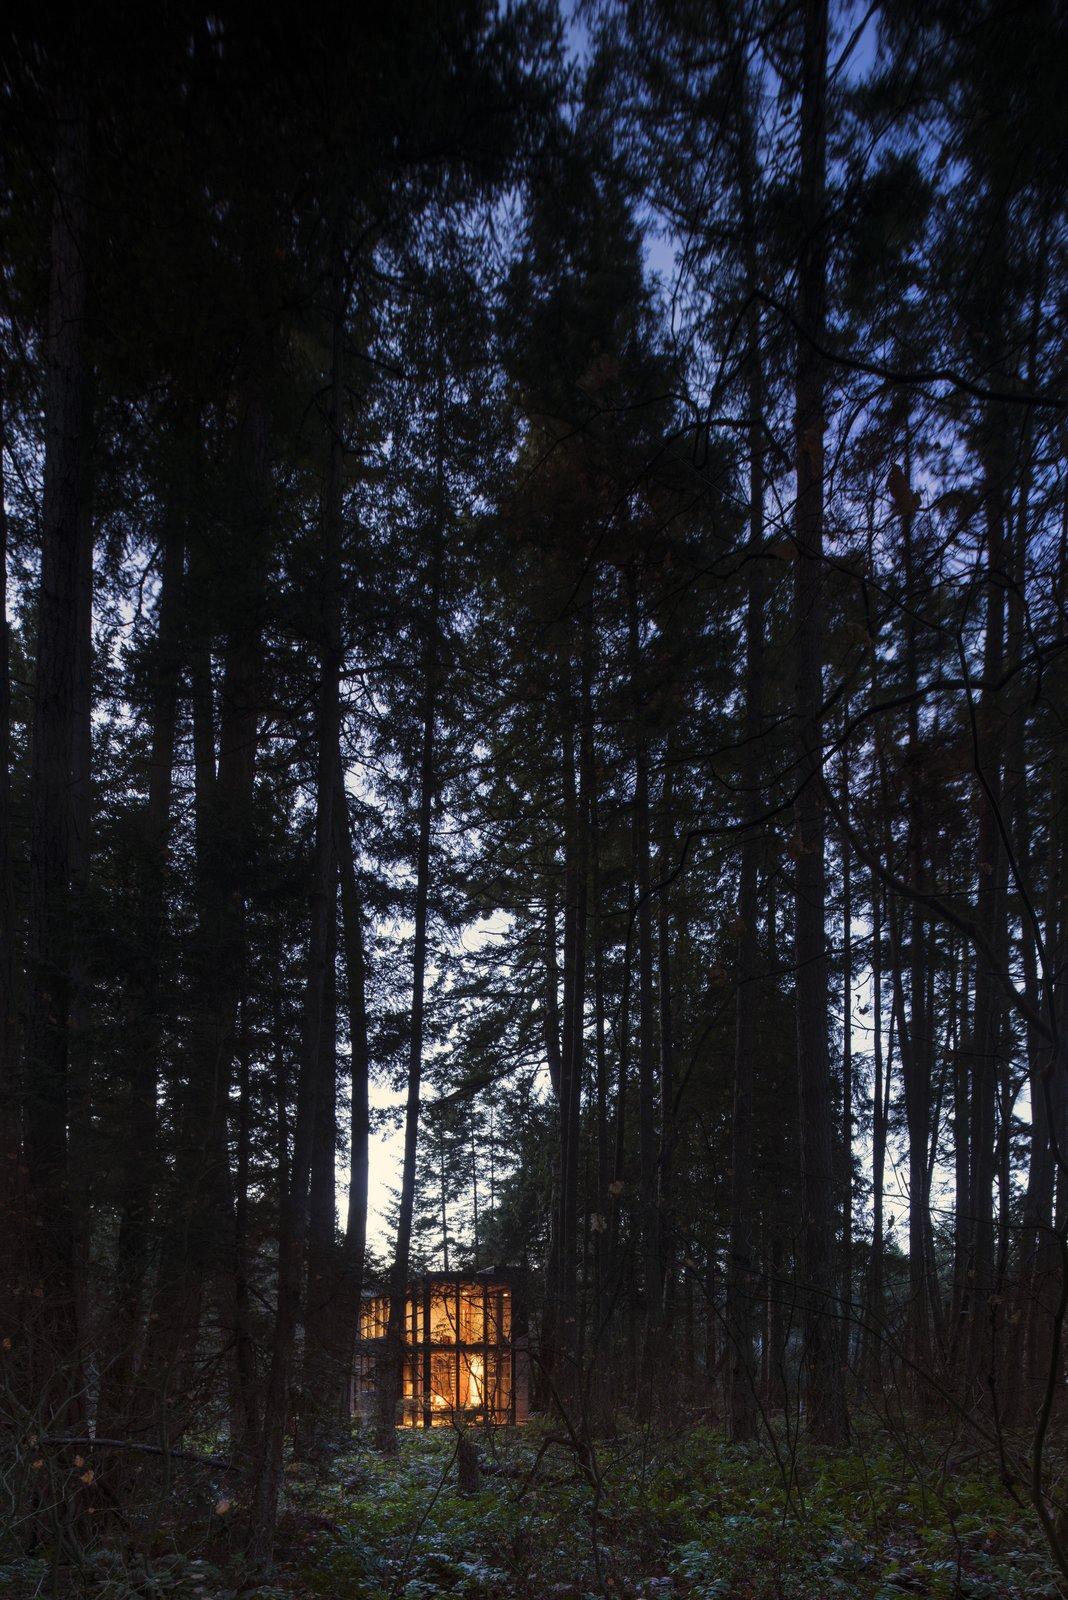 Lightbox by Bohlin Cywinski Jackson